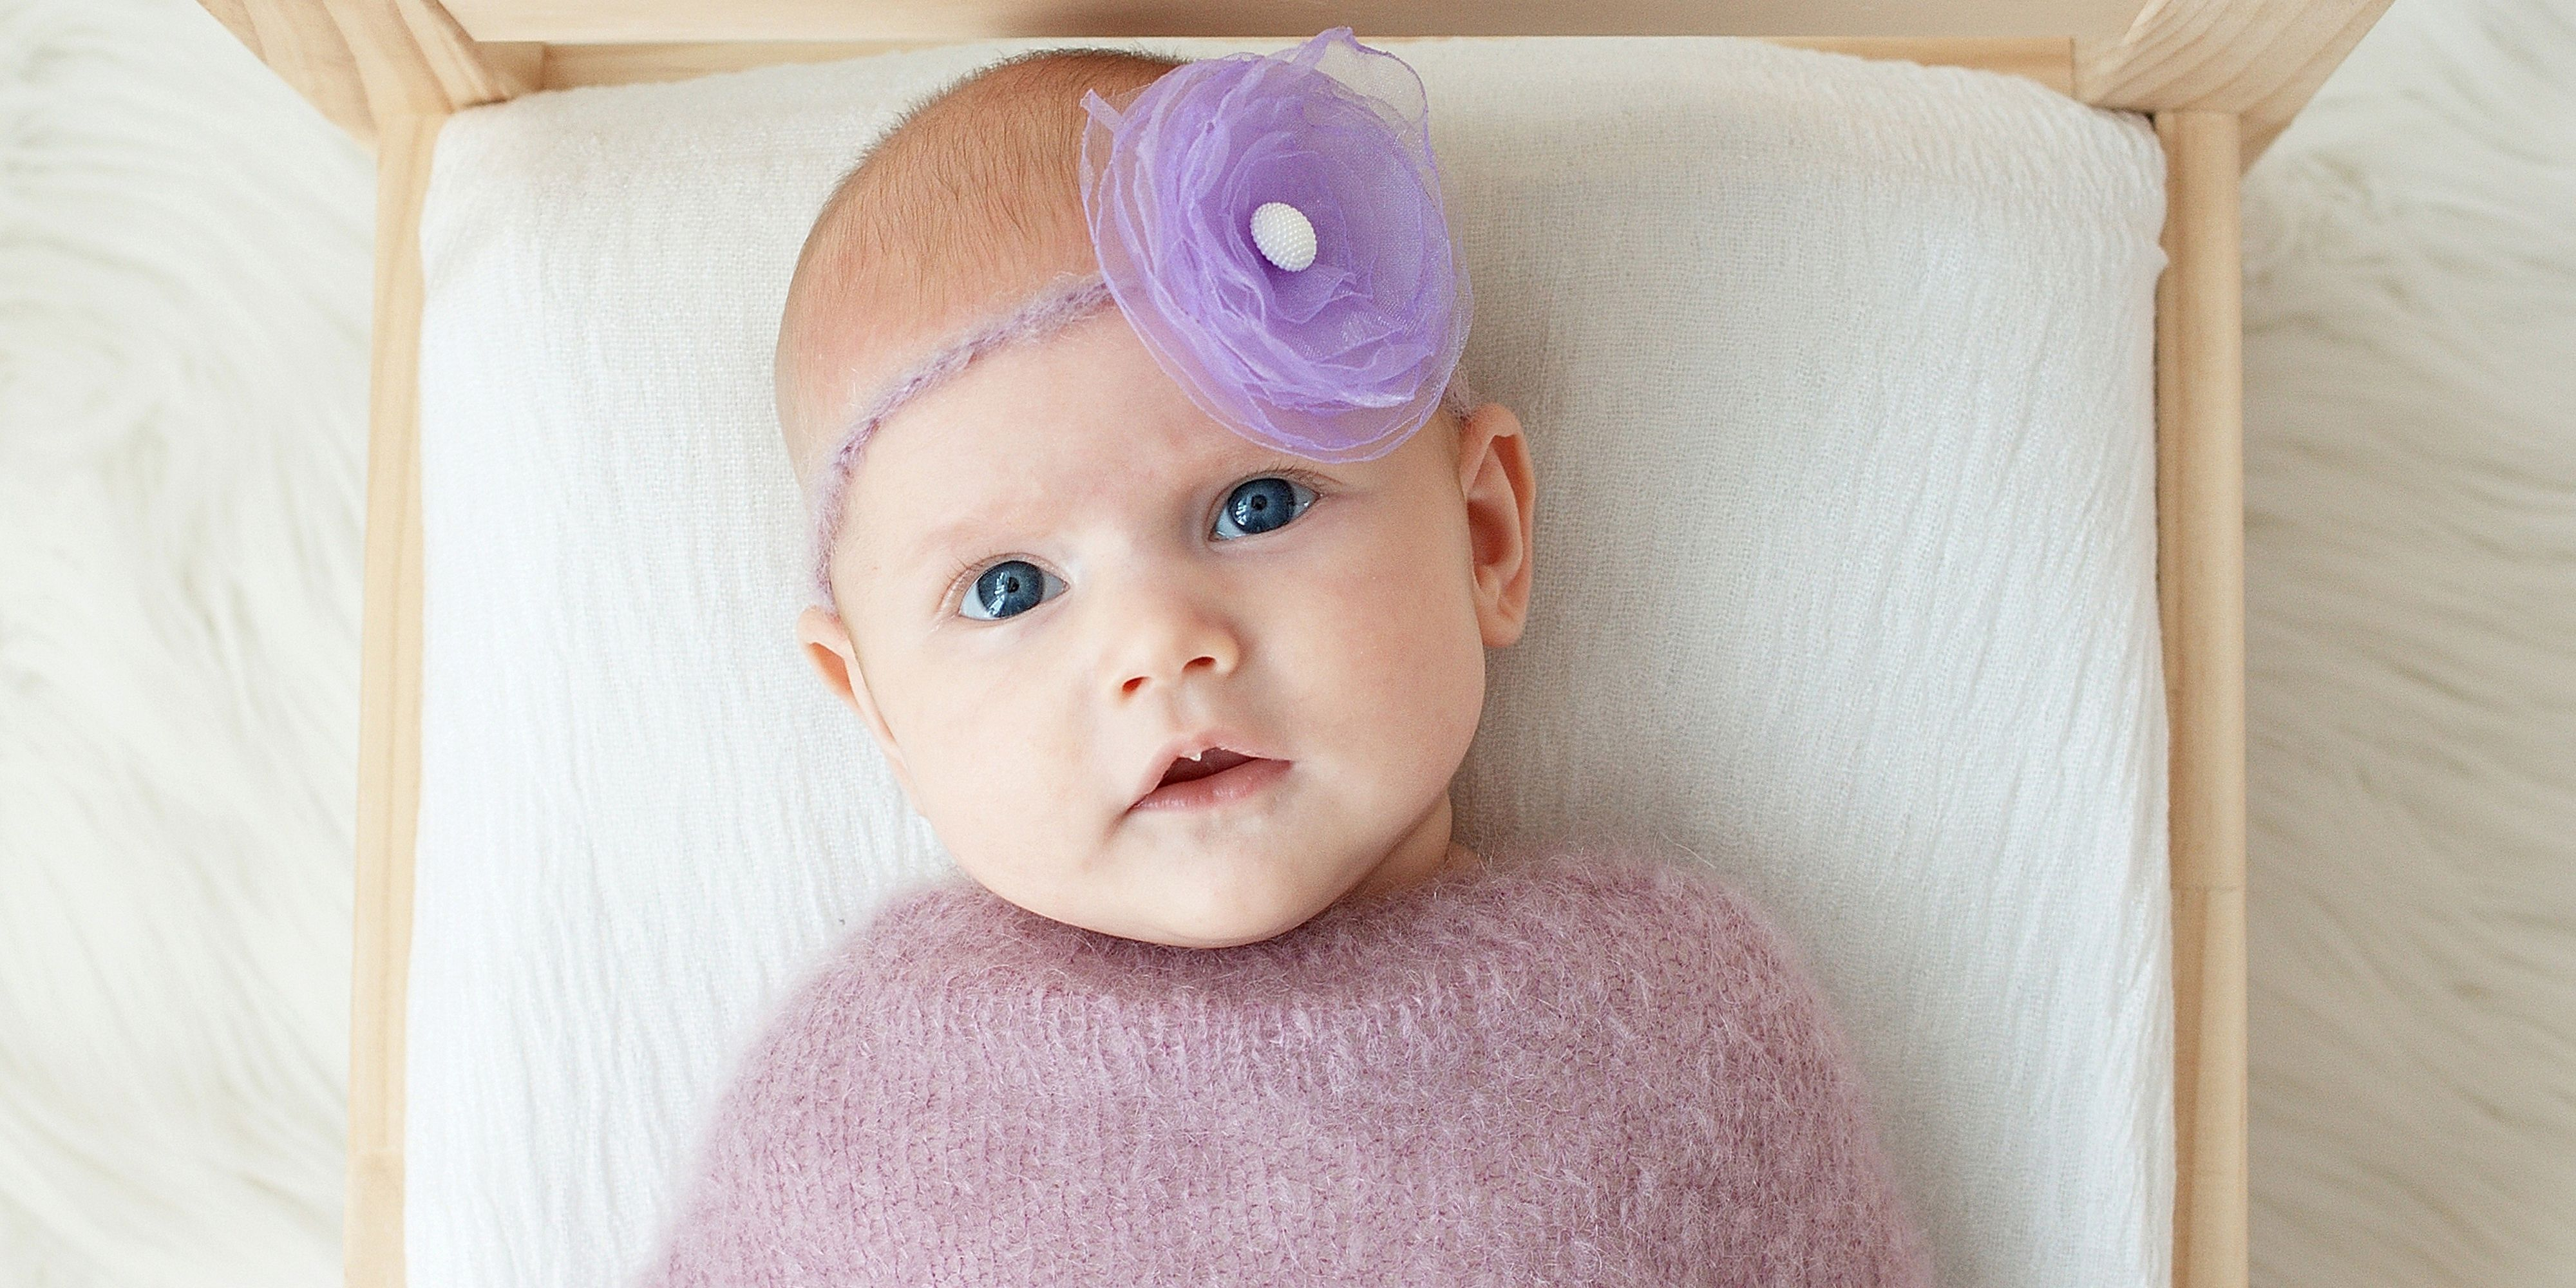 Baby with purple flower headband